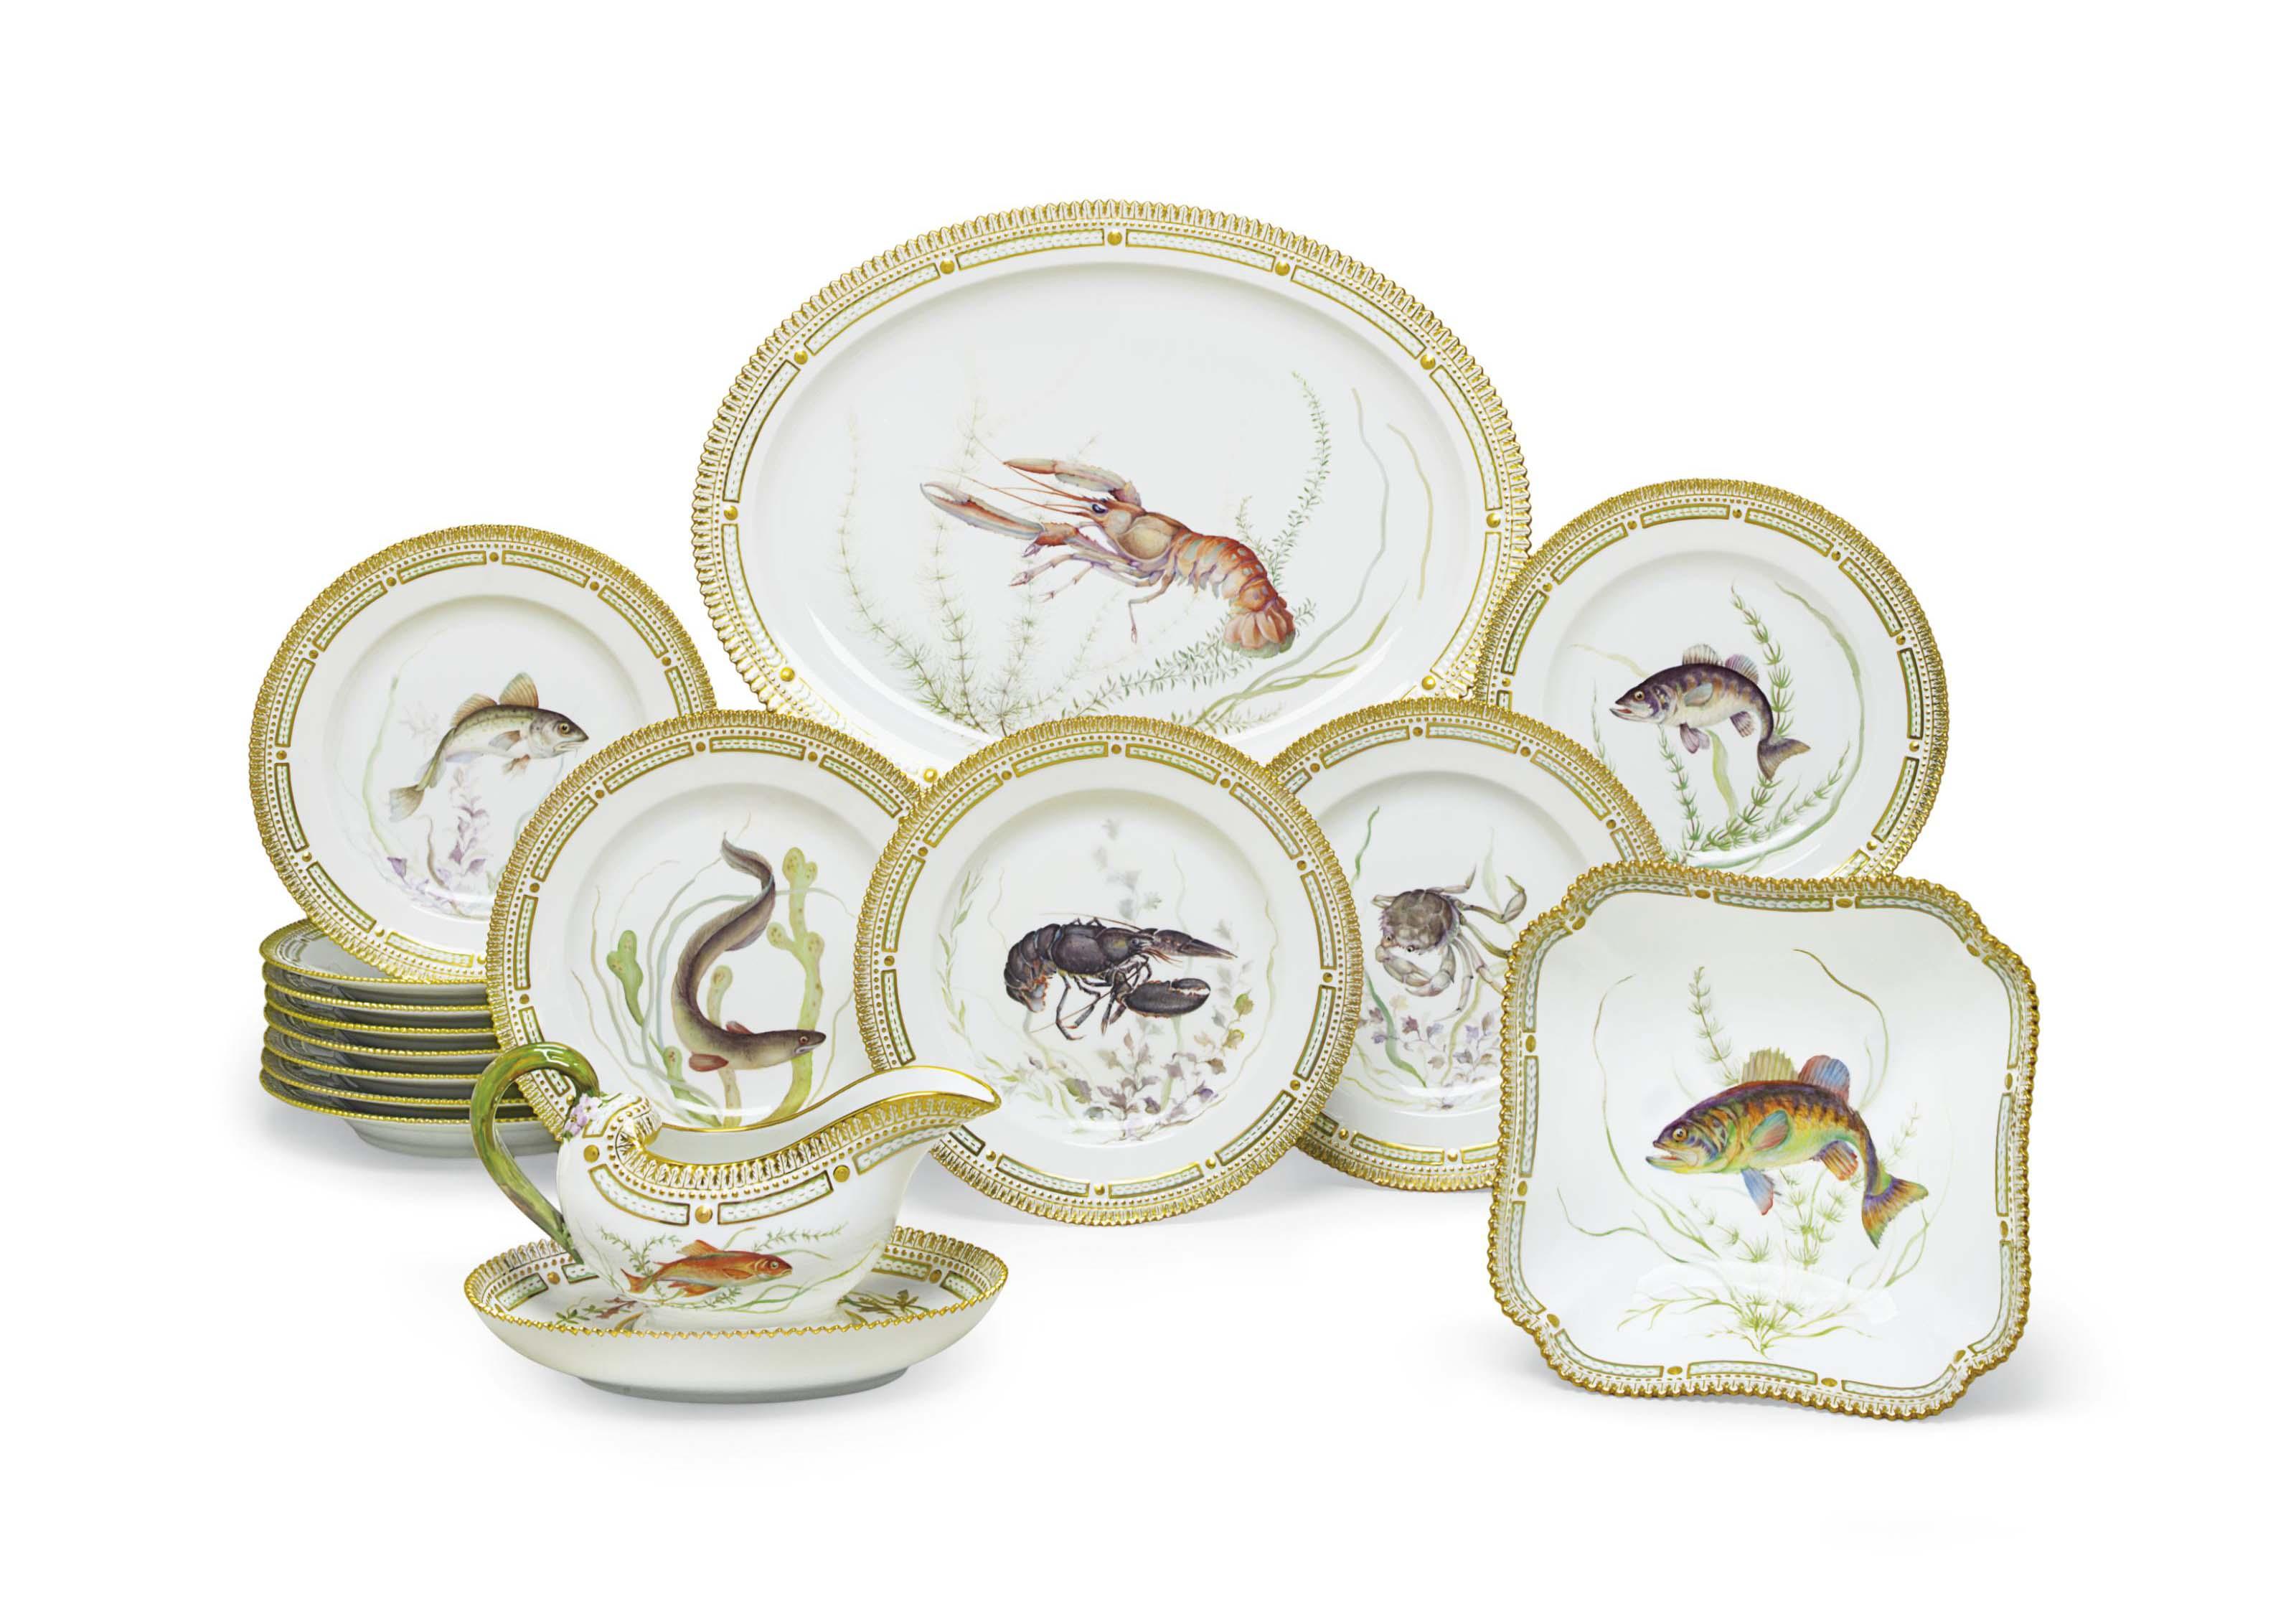 A Royal Copenhagen Porcelain Ichtyological Part Dinner  sc 1 st  Castrophotos & Tableset and Tableware - Castrophotos